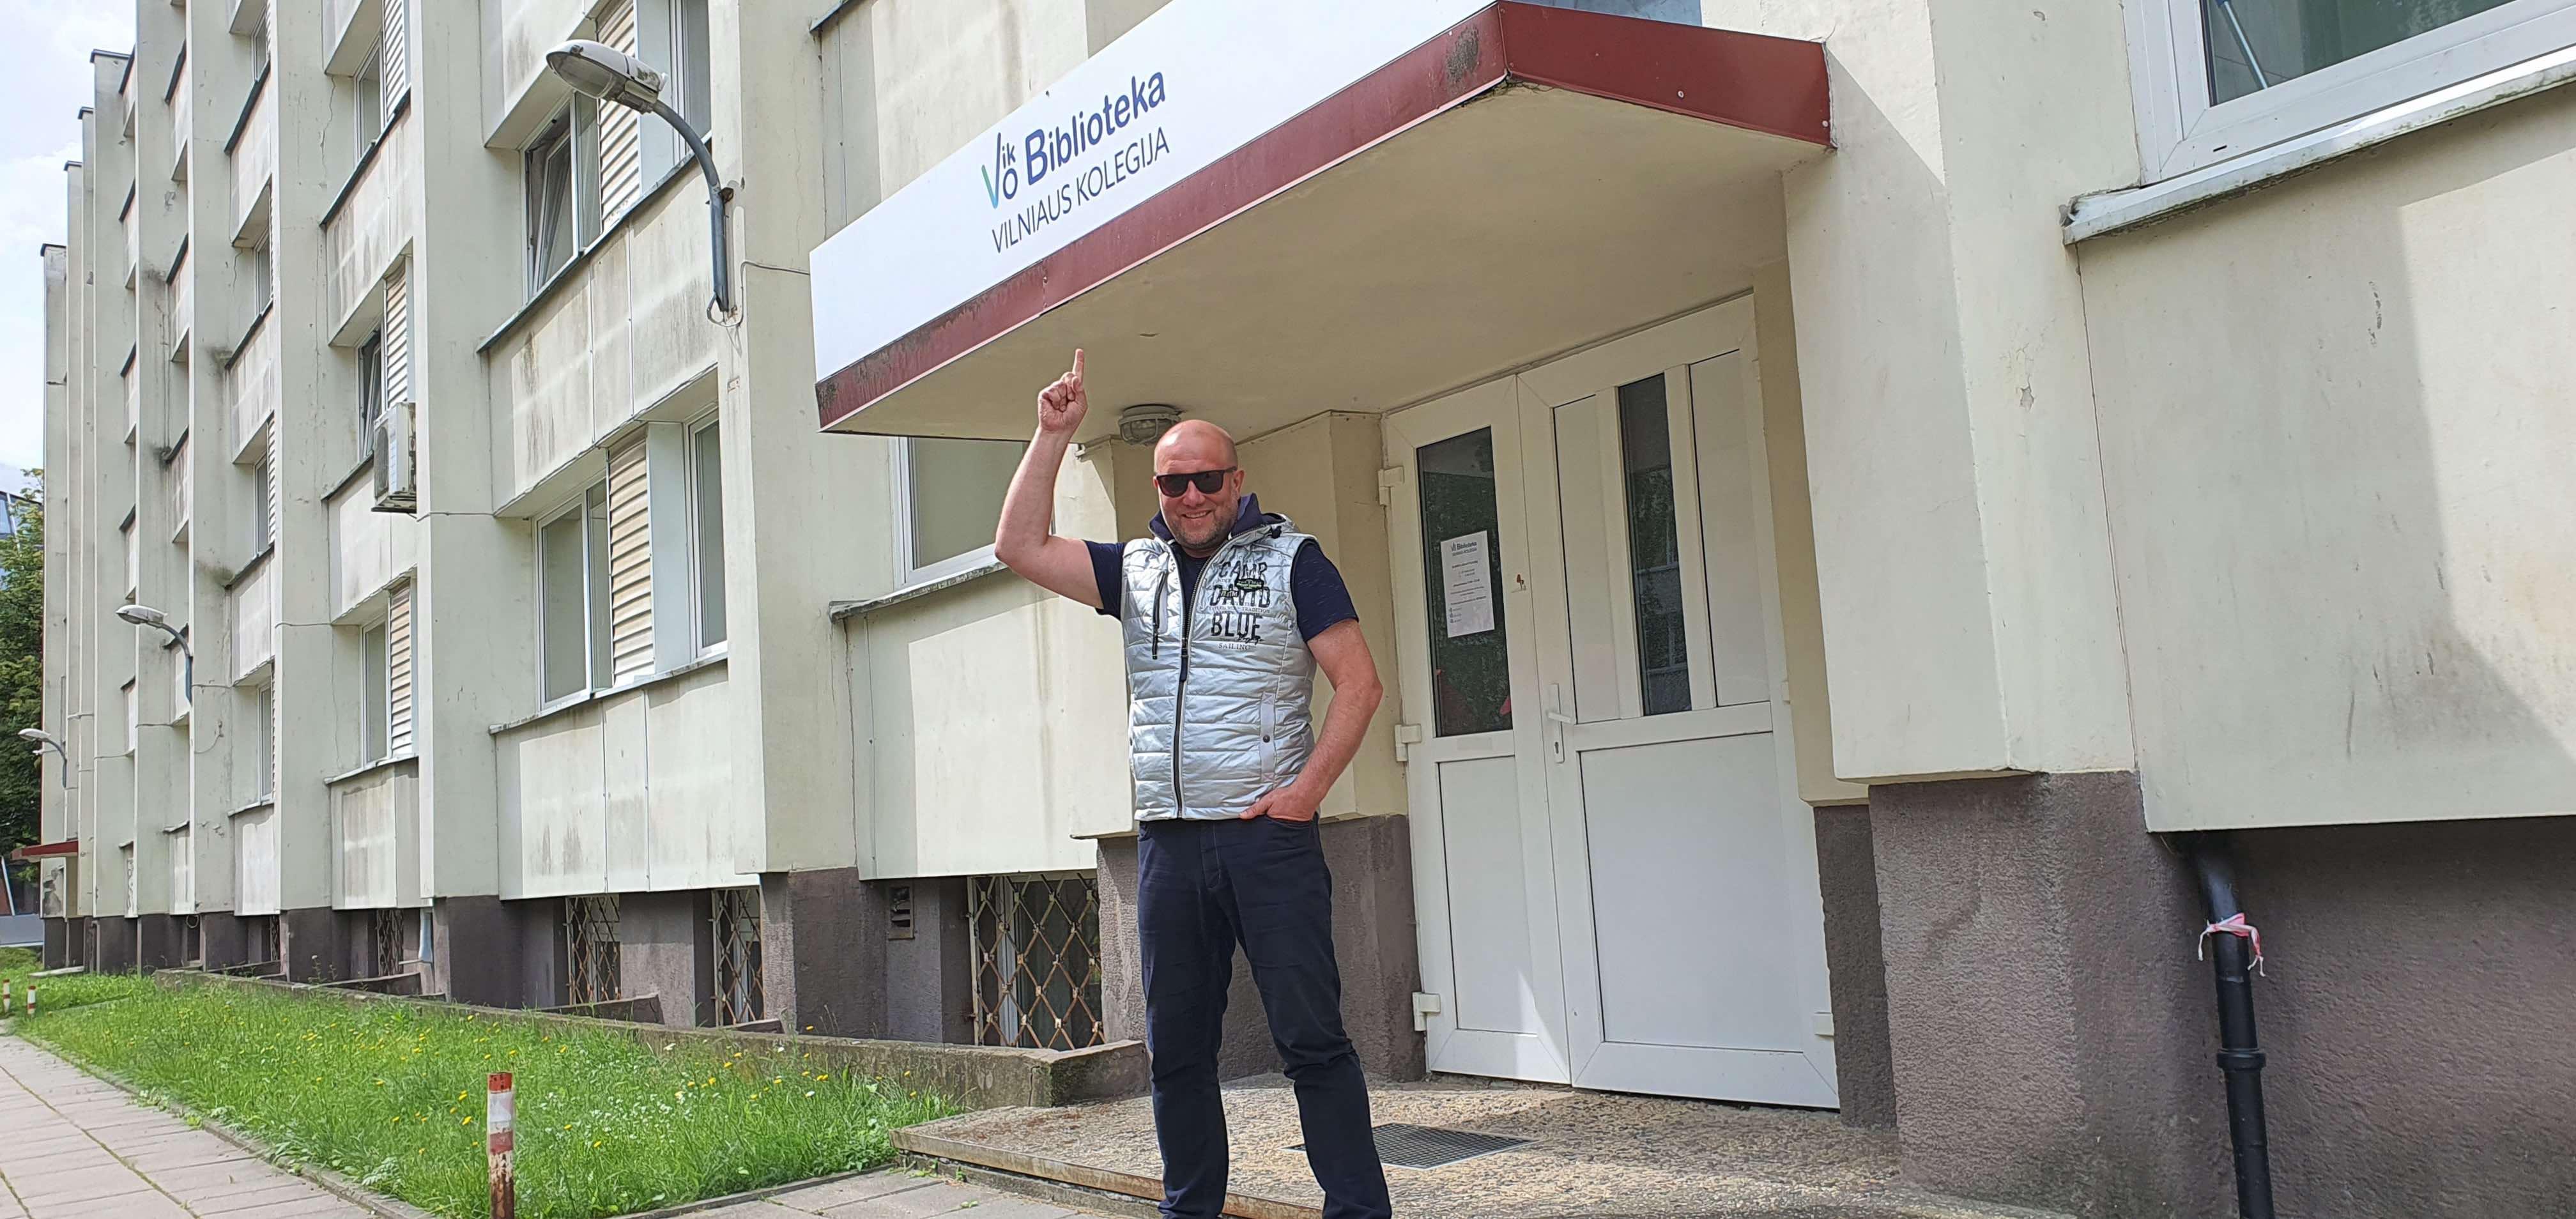 Vilniaus Pedagoginio instituto diskoteka   T. Augulio nuotr.